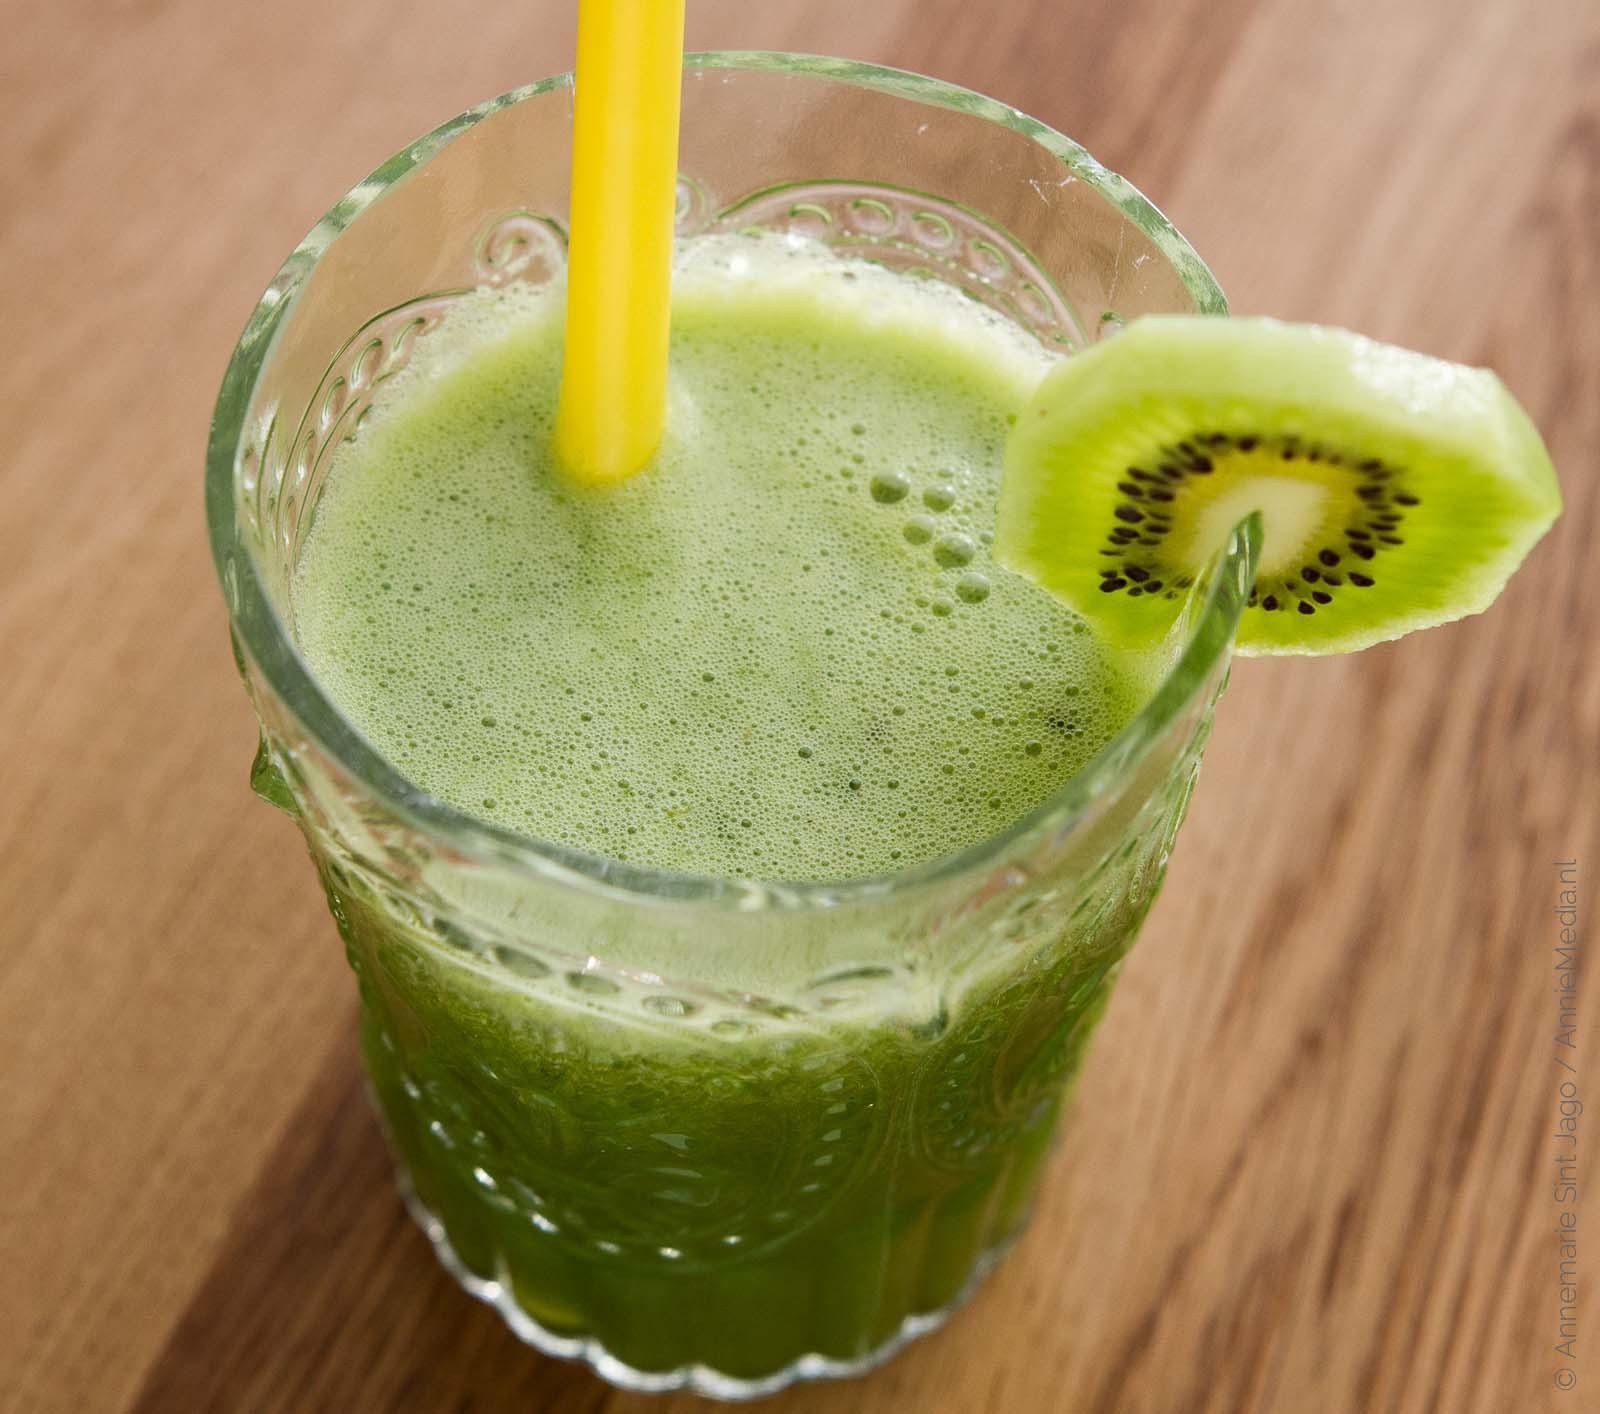 Slow Juicer Kiwi : Slowjuice-sapje Kiwi Appel Spinazie - AnnemarieSintJago.nl